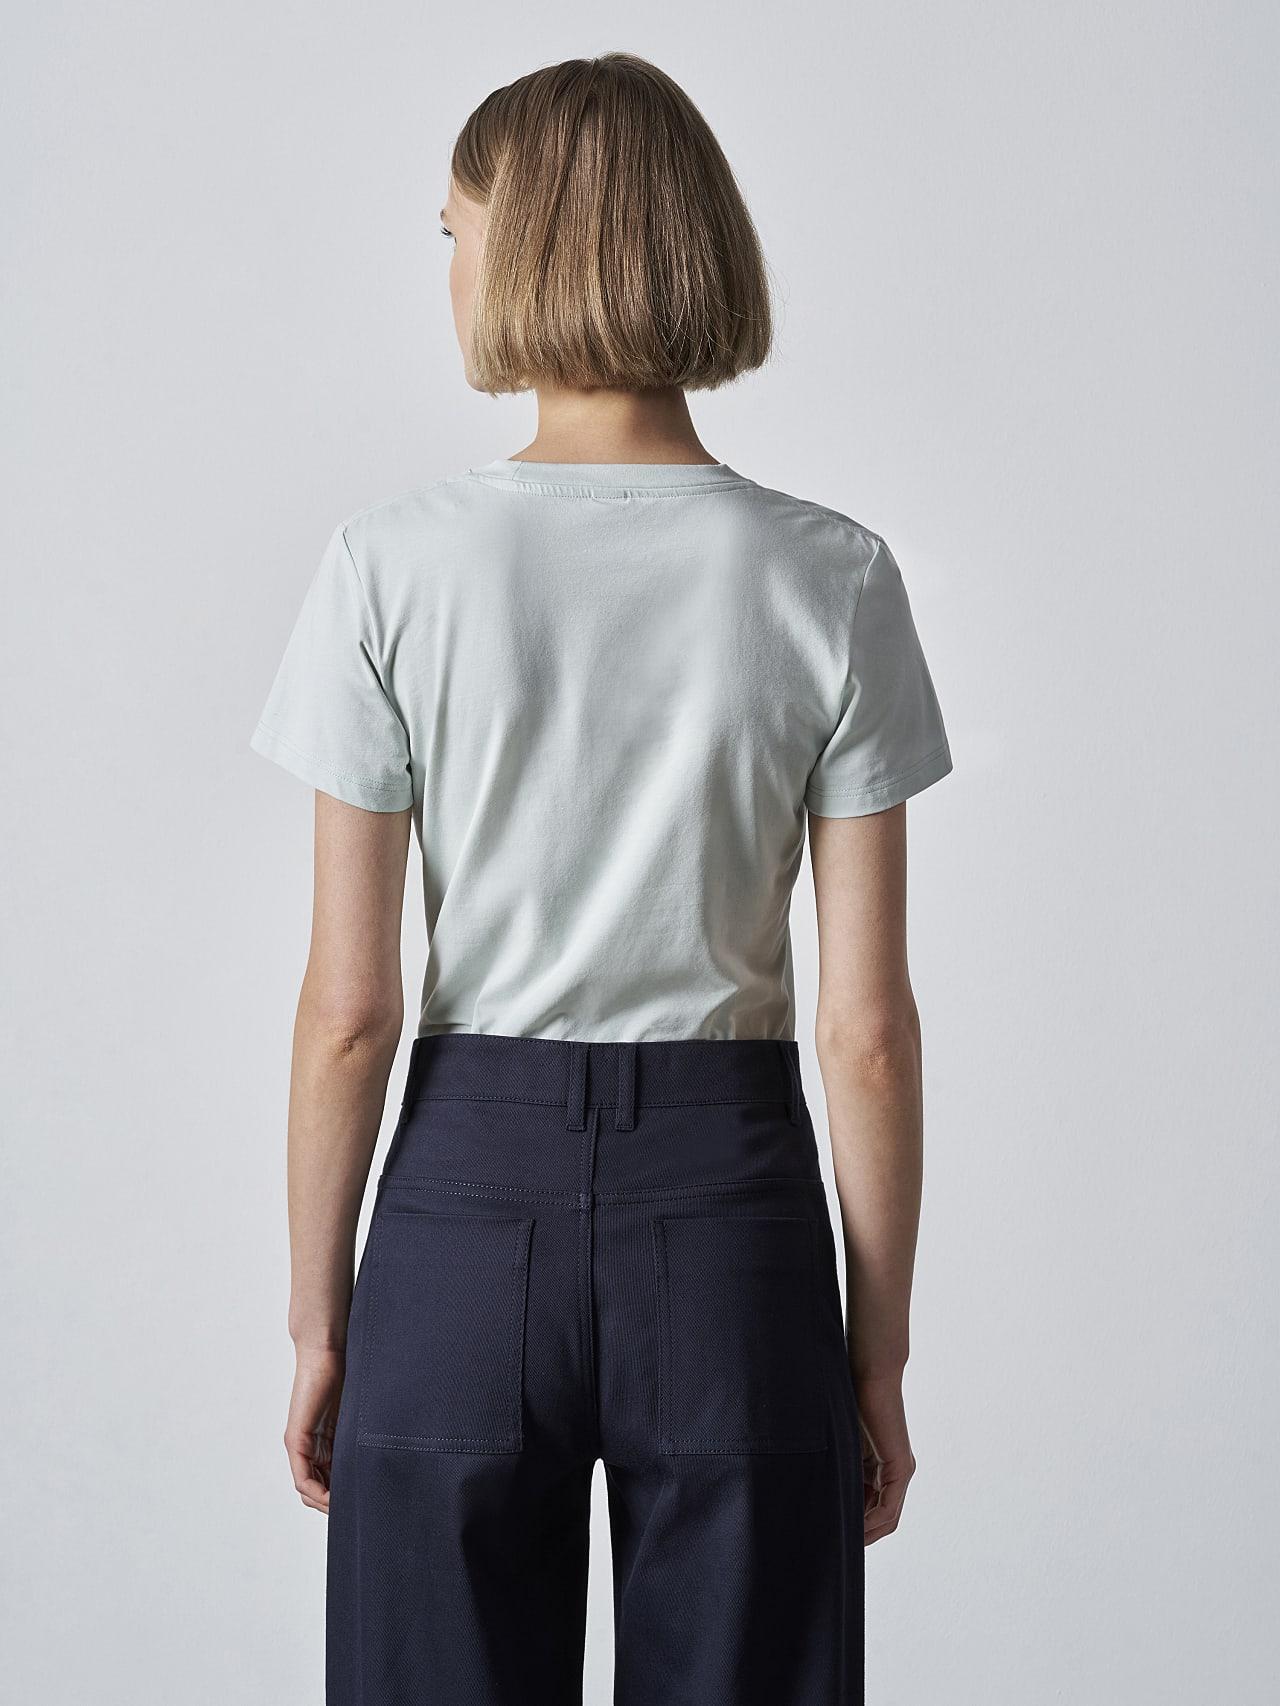 JOCTI V3.Y5.02 Logo T-Shirt Pale Blue  Front Main Alpha Tauri